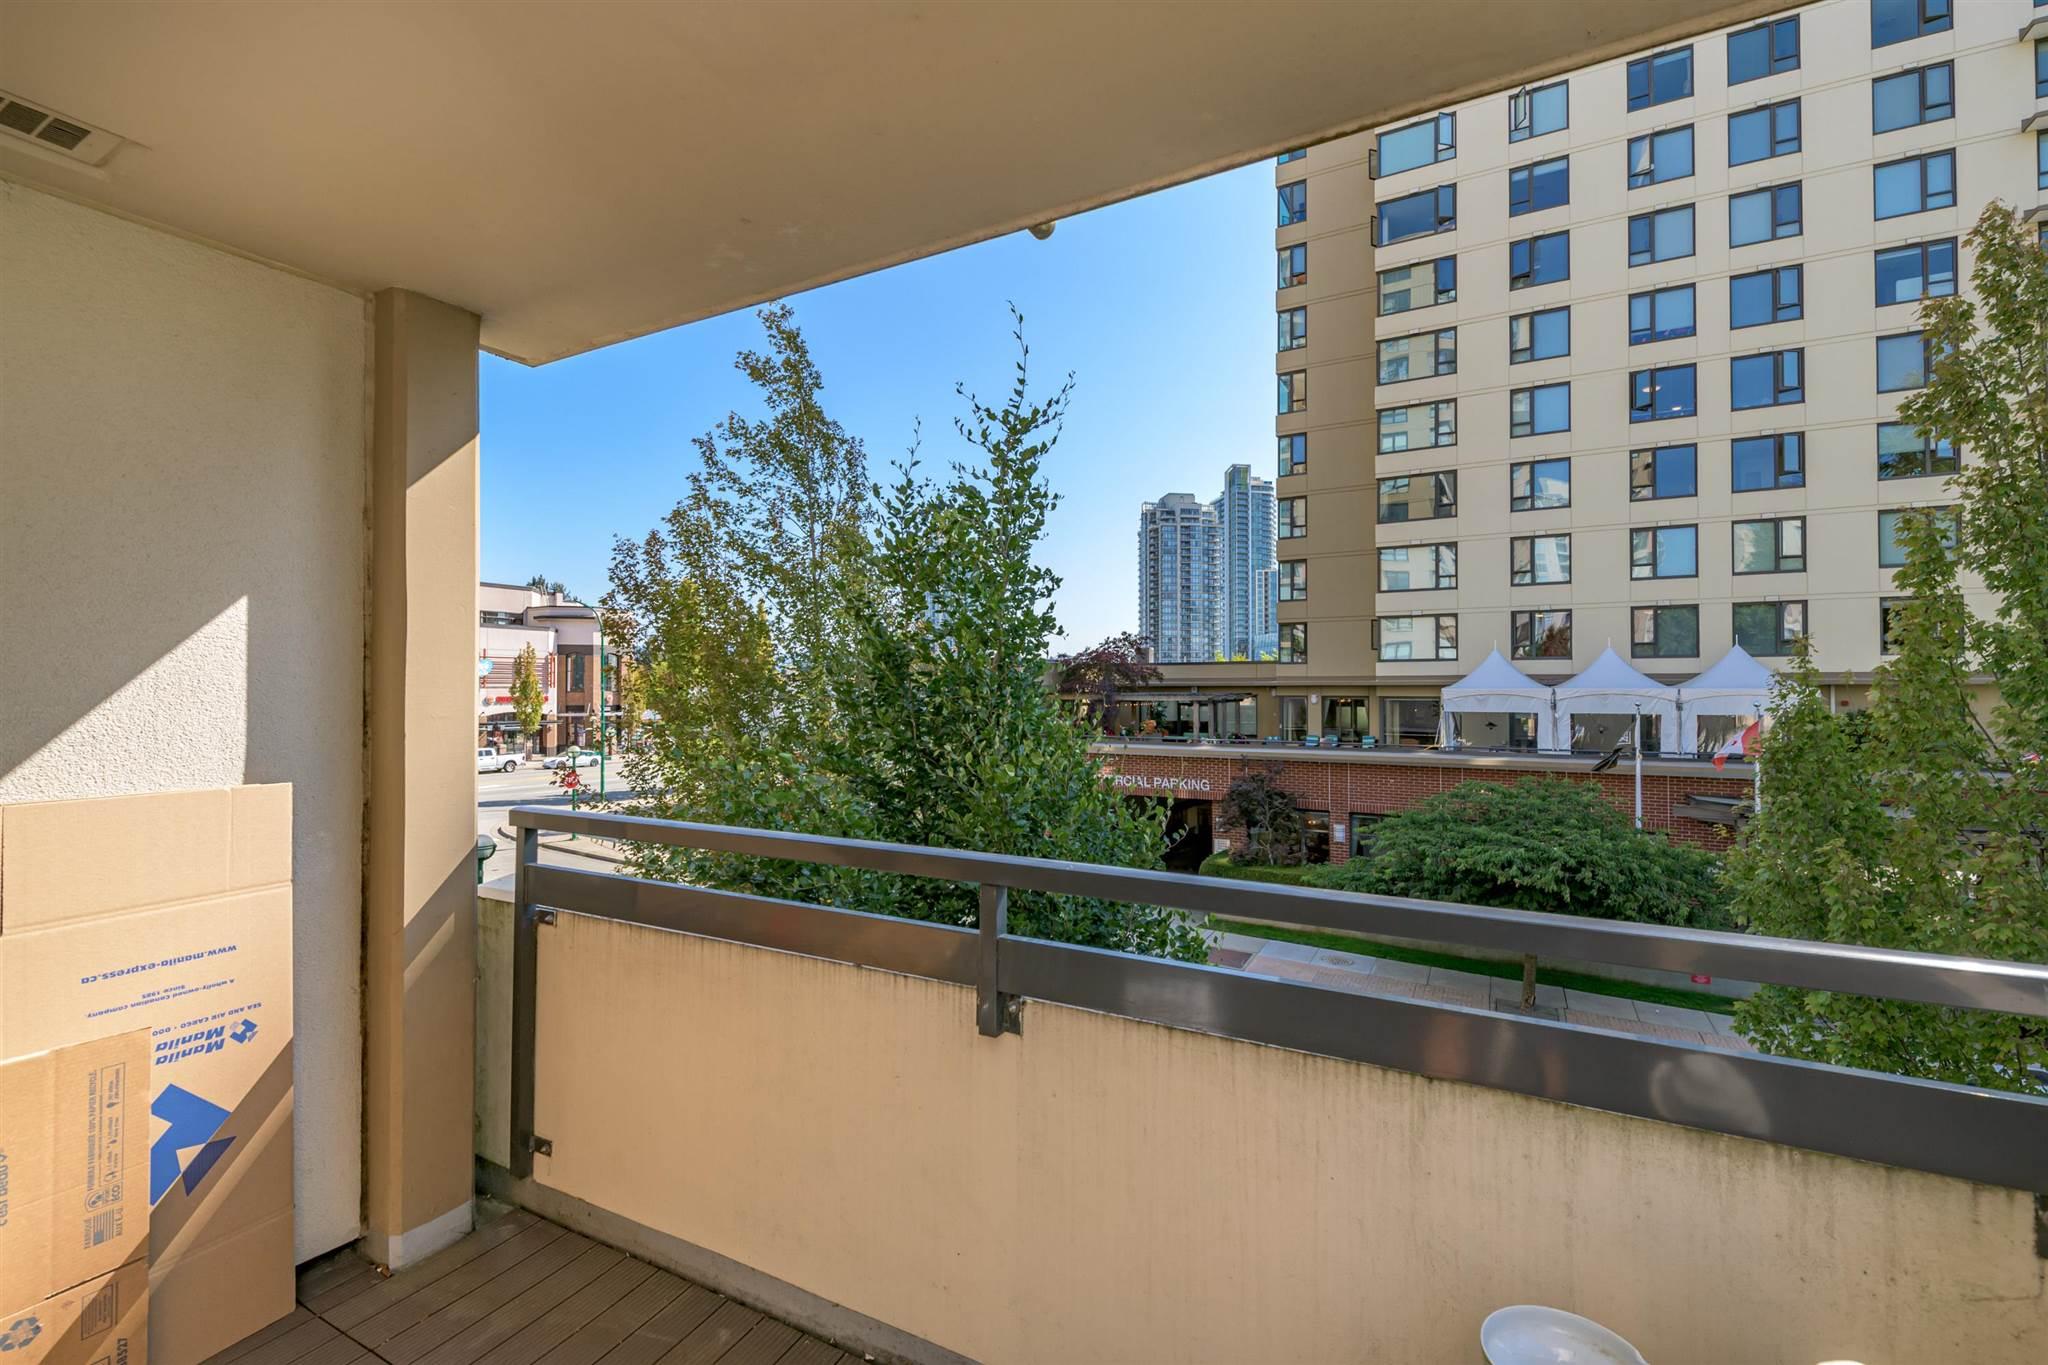 205 7225 ACORN AVENUE - Highgate Apartment/Condo for sale, 2 Bedrooms (R2606454) - #21